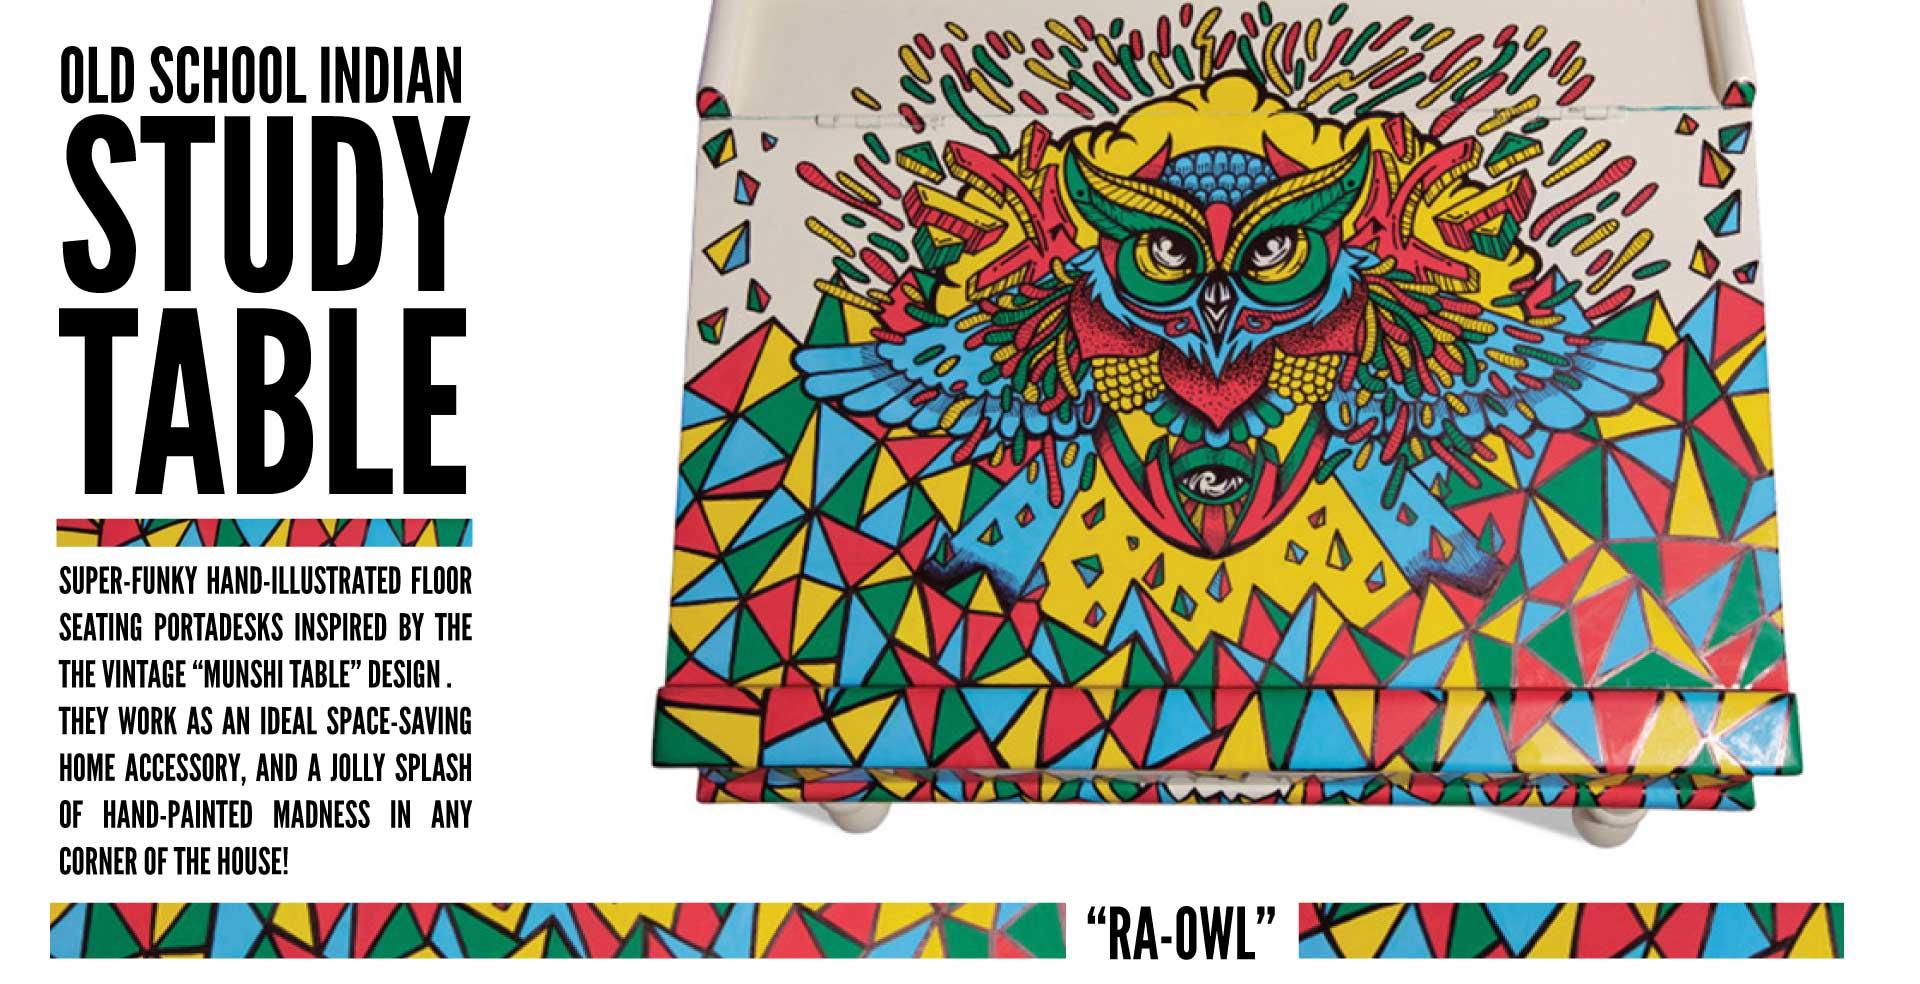 Ra Owl – Munshi Table